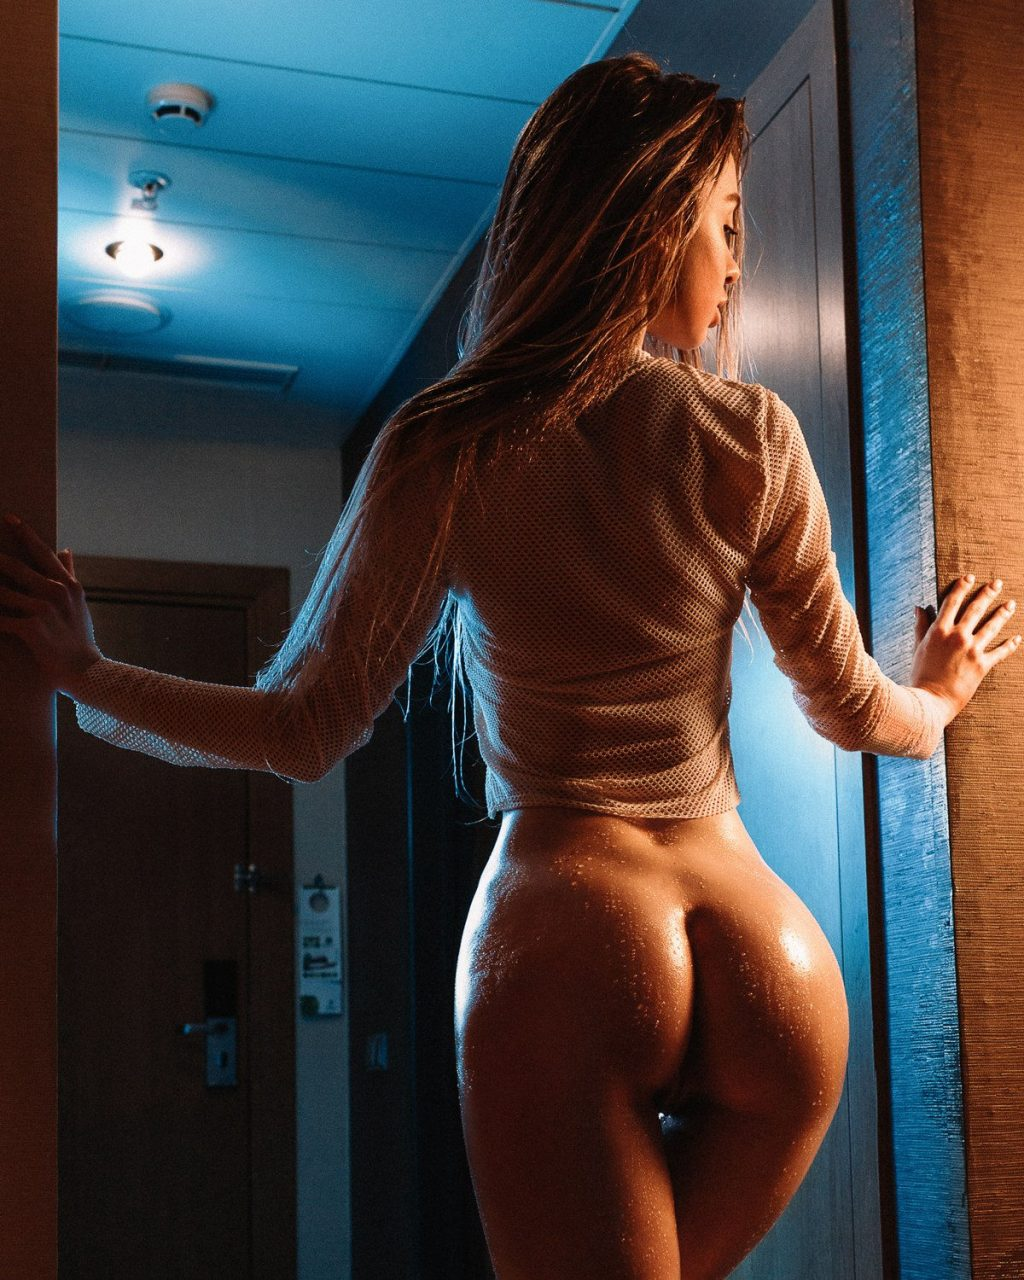 Anna tsaralunga nude